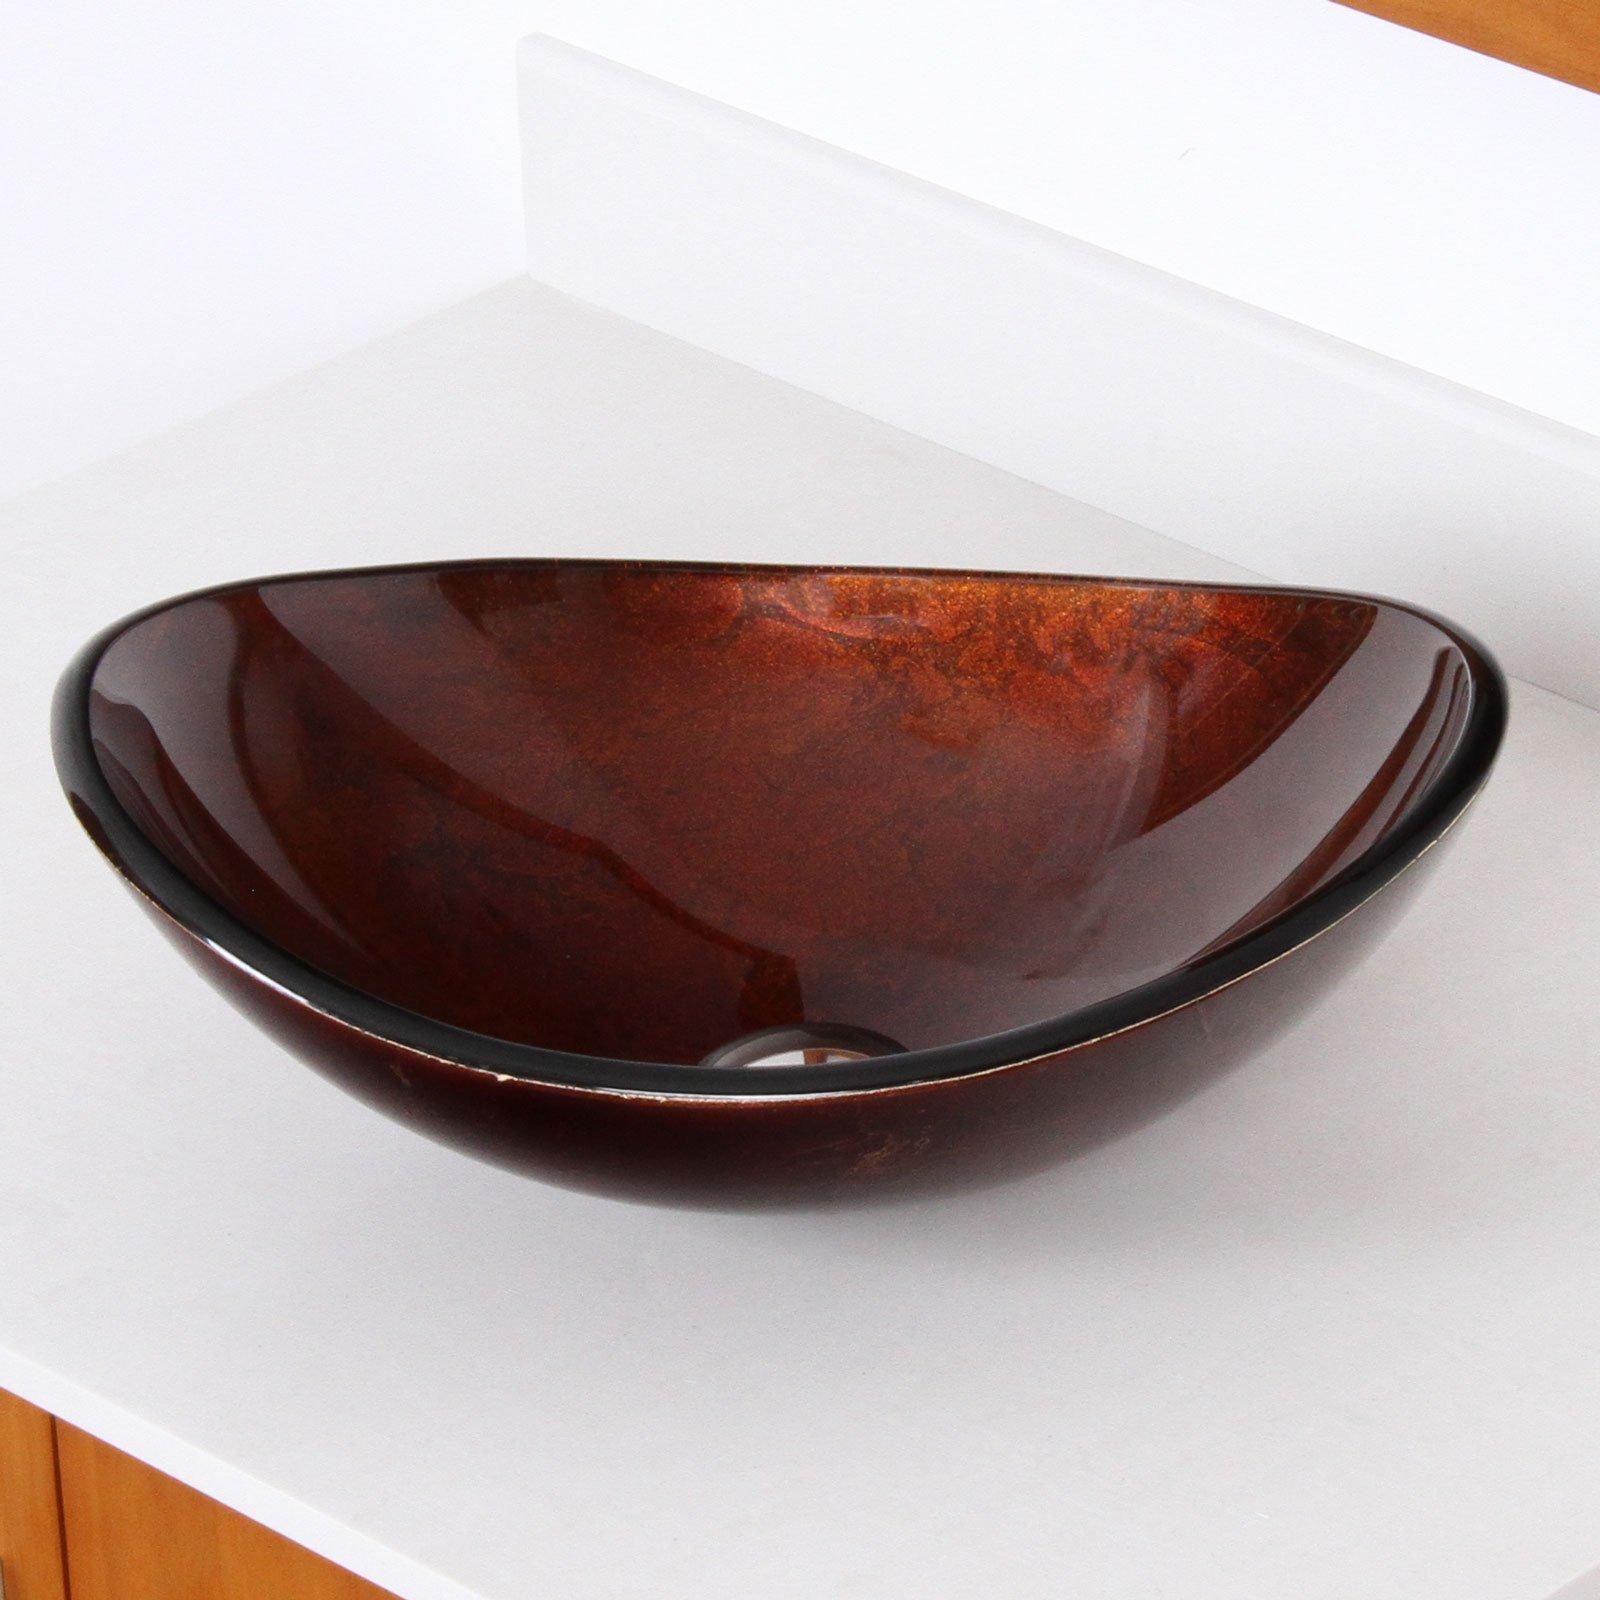 Hand Painted Foil Boat Shaped Oval Bowl Bottom Vessel Bathroom Sink Sink Finish: Artistic Bronze